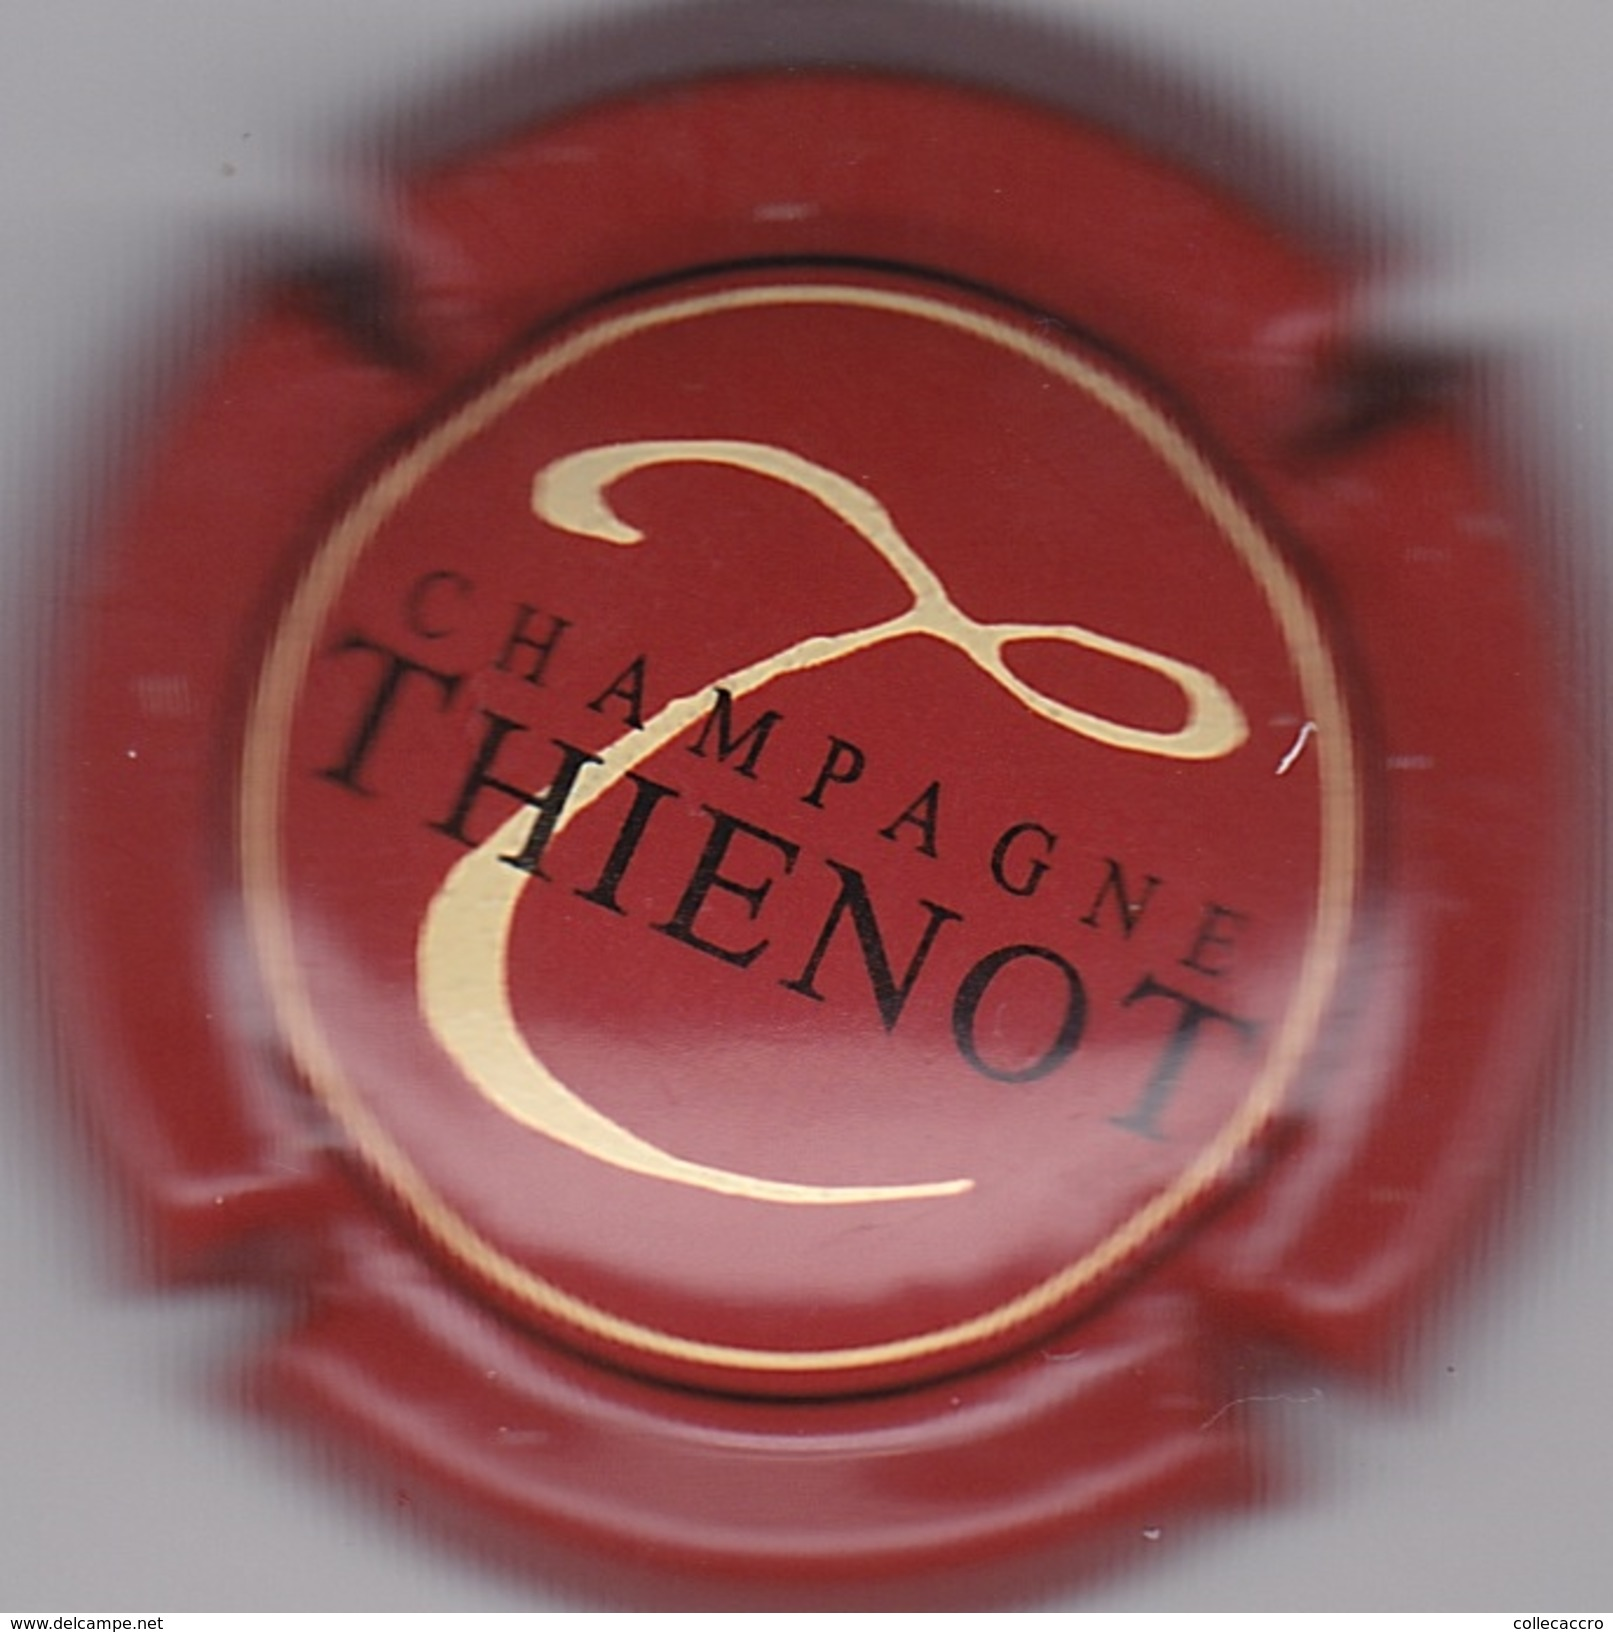 THIENOT N°18 - Champagne